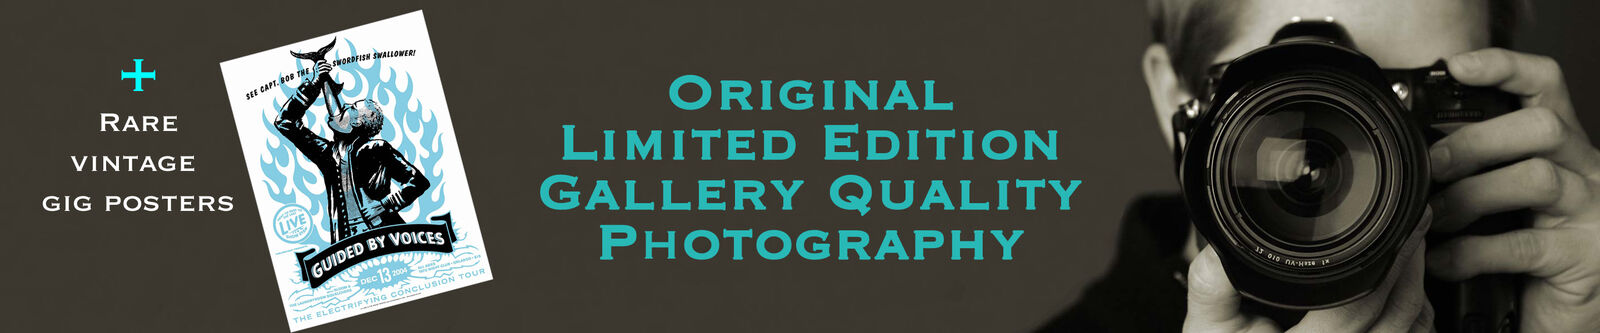 Segami Photography/RareGig Posters